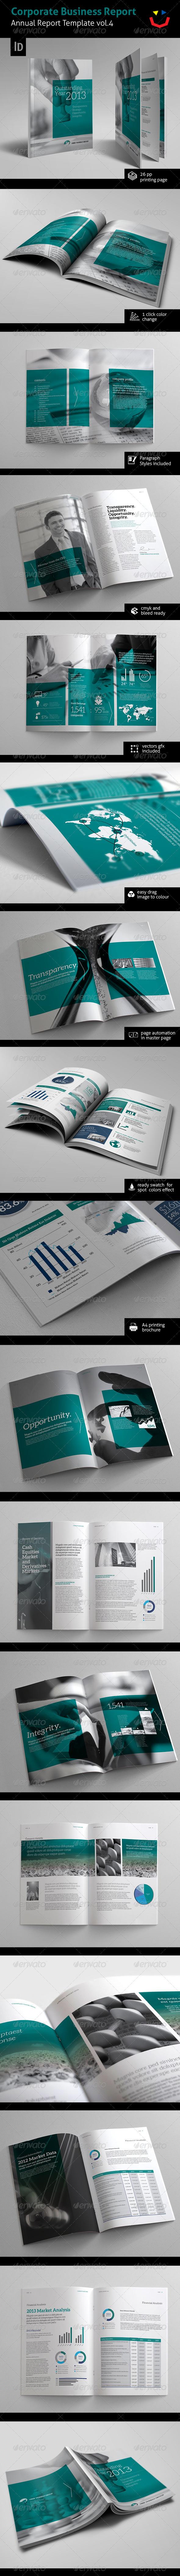 Corporate Annual Report Vol.4 - Corporate Brochures